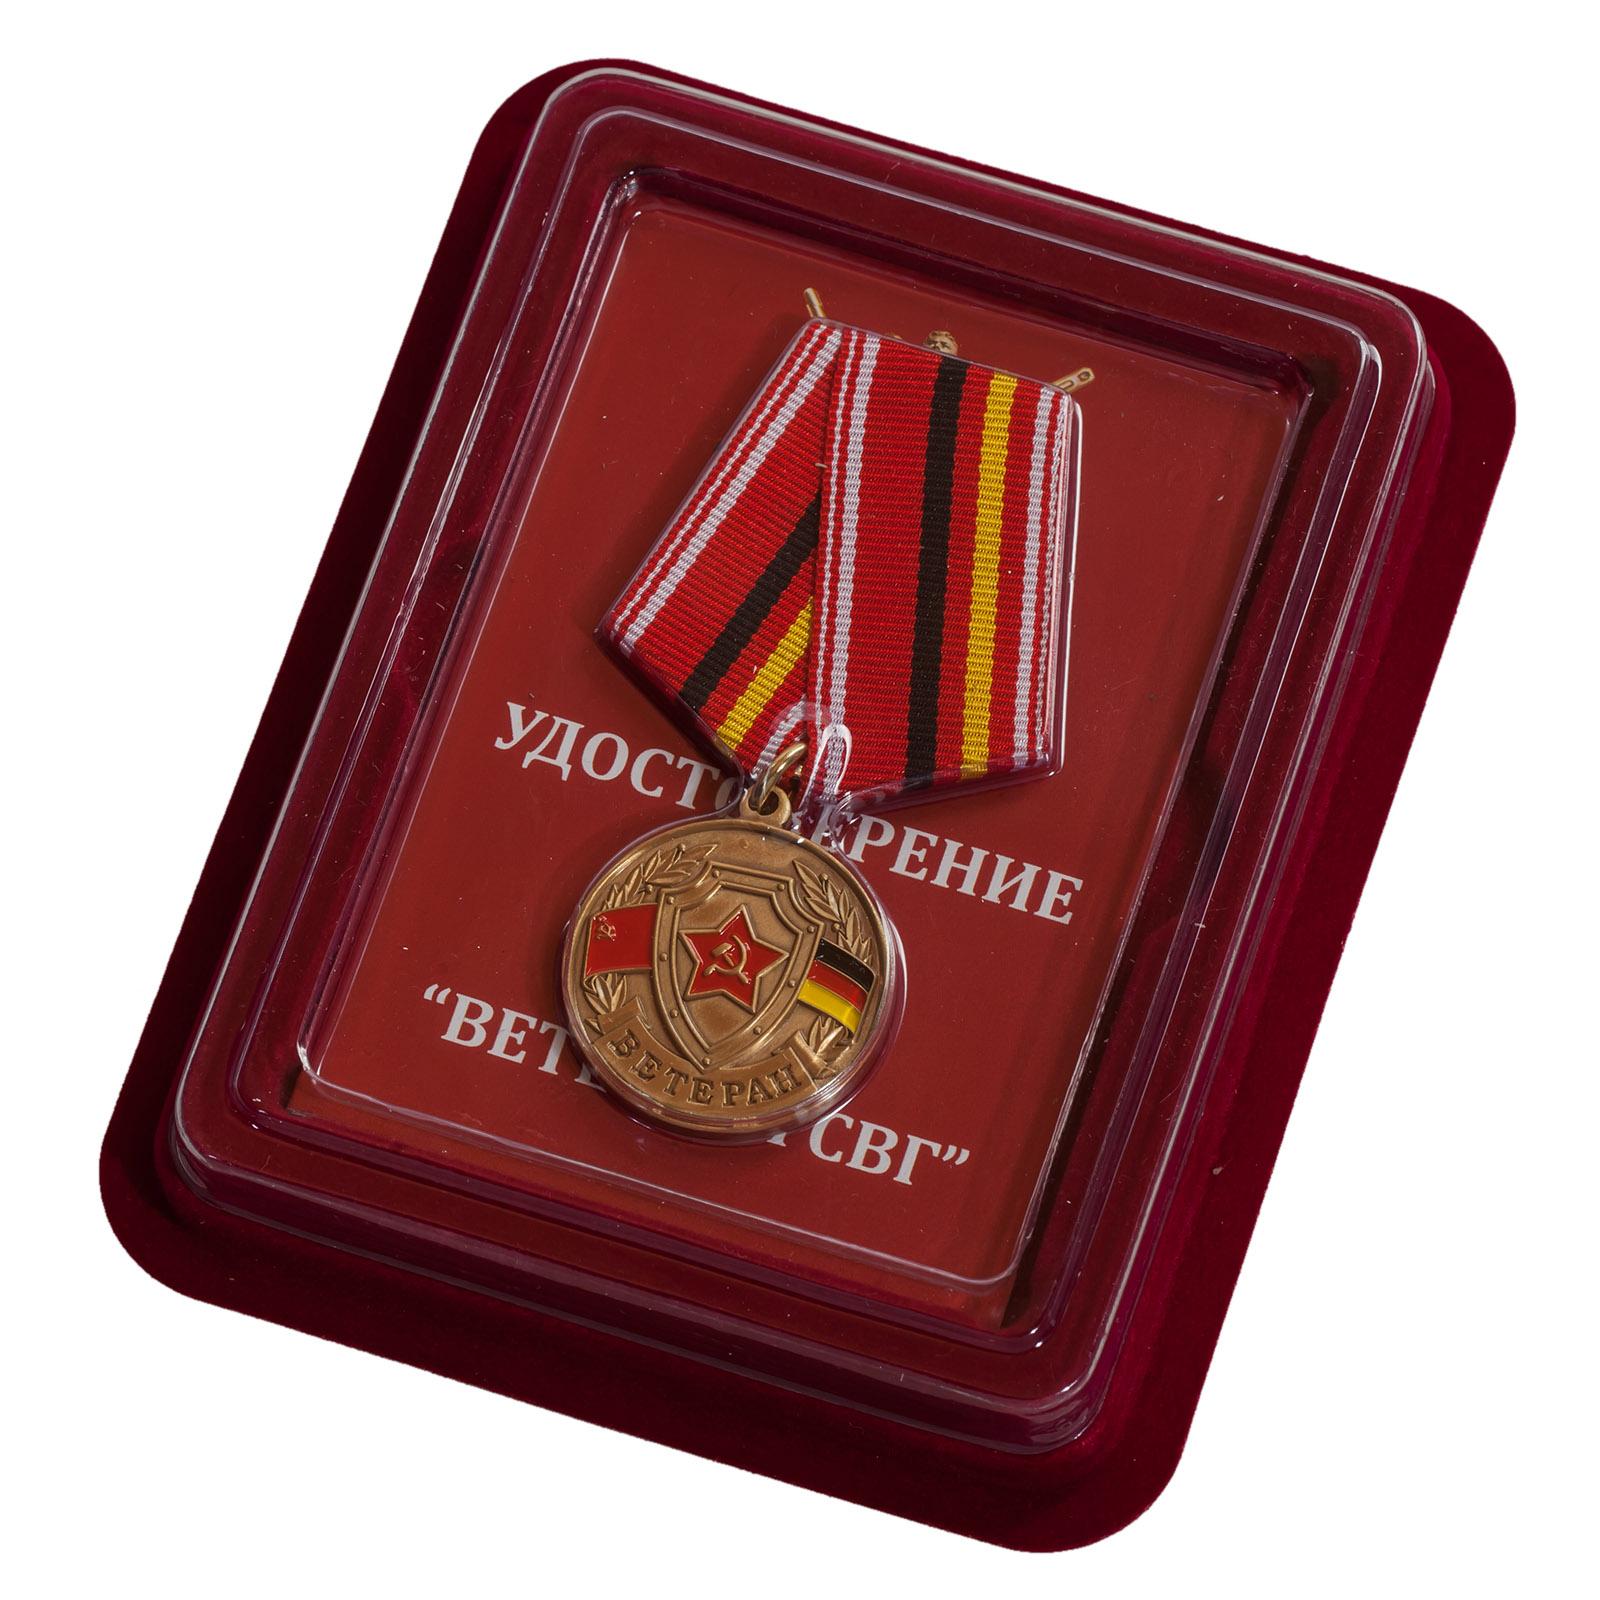 Продажа медалей ГСВГ на сайте Военпро – скидка 50%